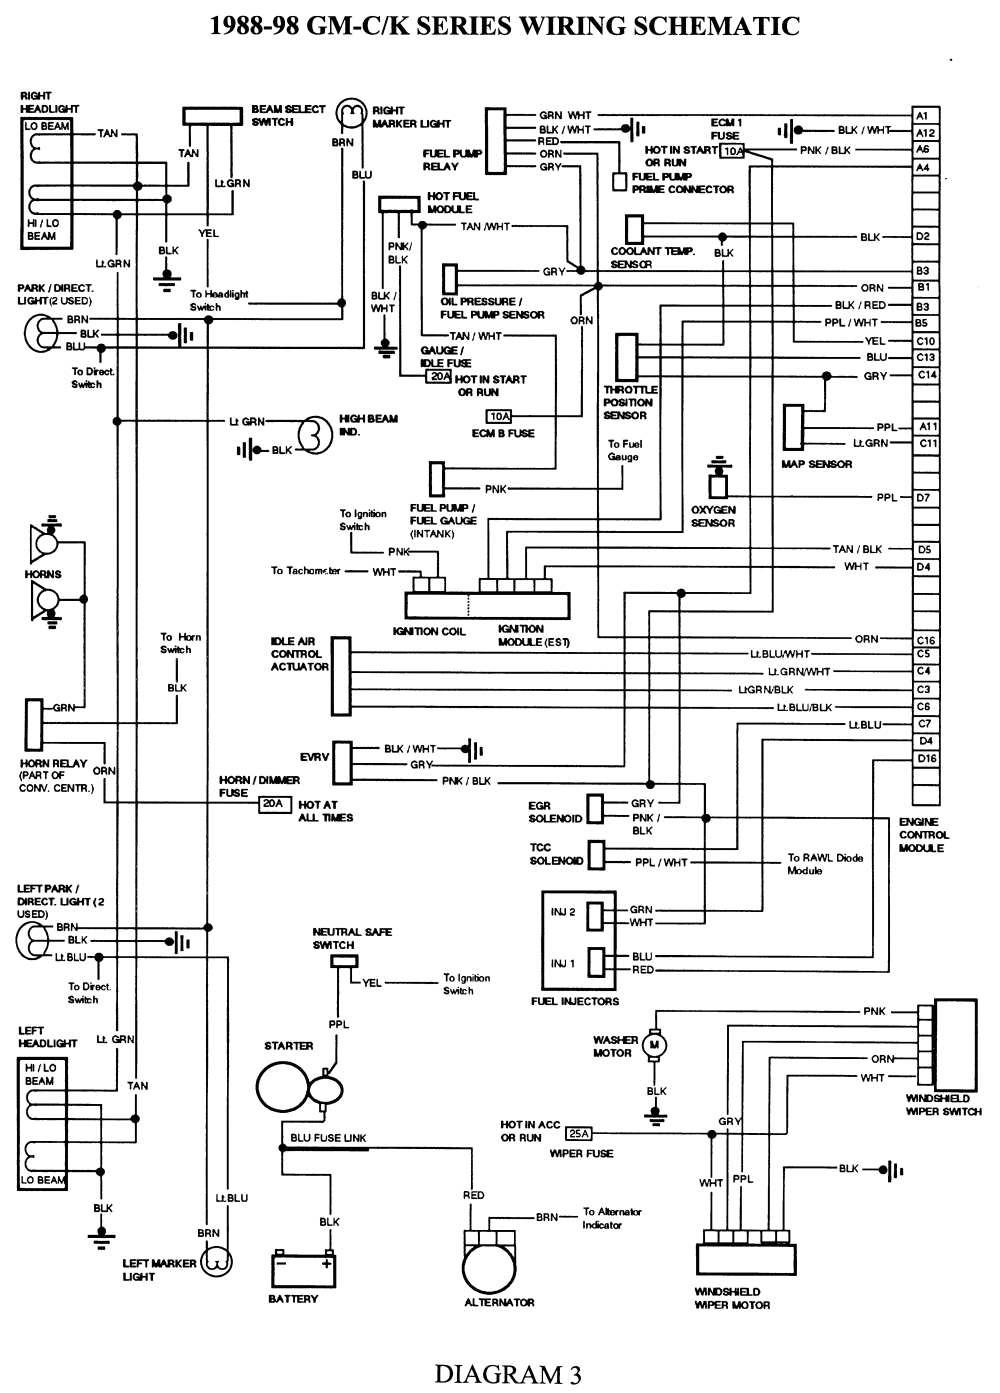 Free 1993 Chevy Silverado Wiring Diagram Repair Guides Wiring Diagrams Wiring Diagrams Autozone Com